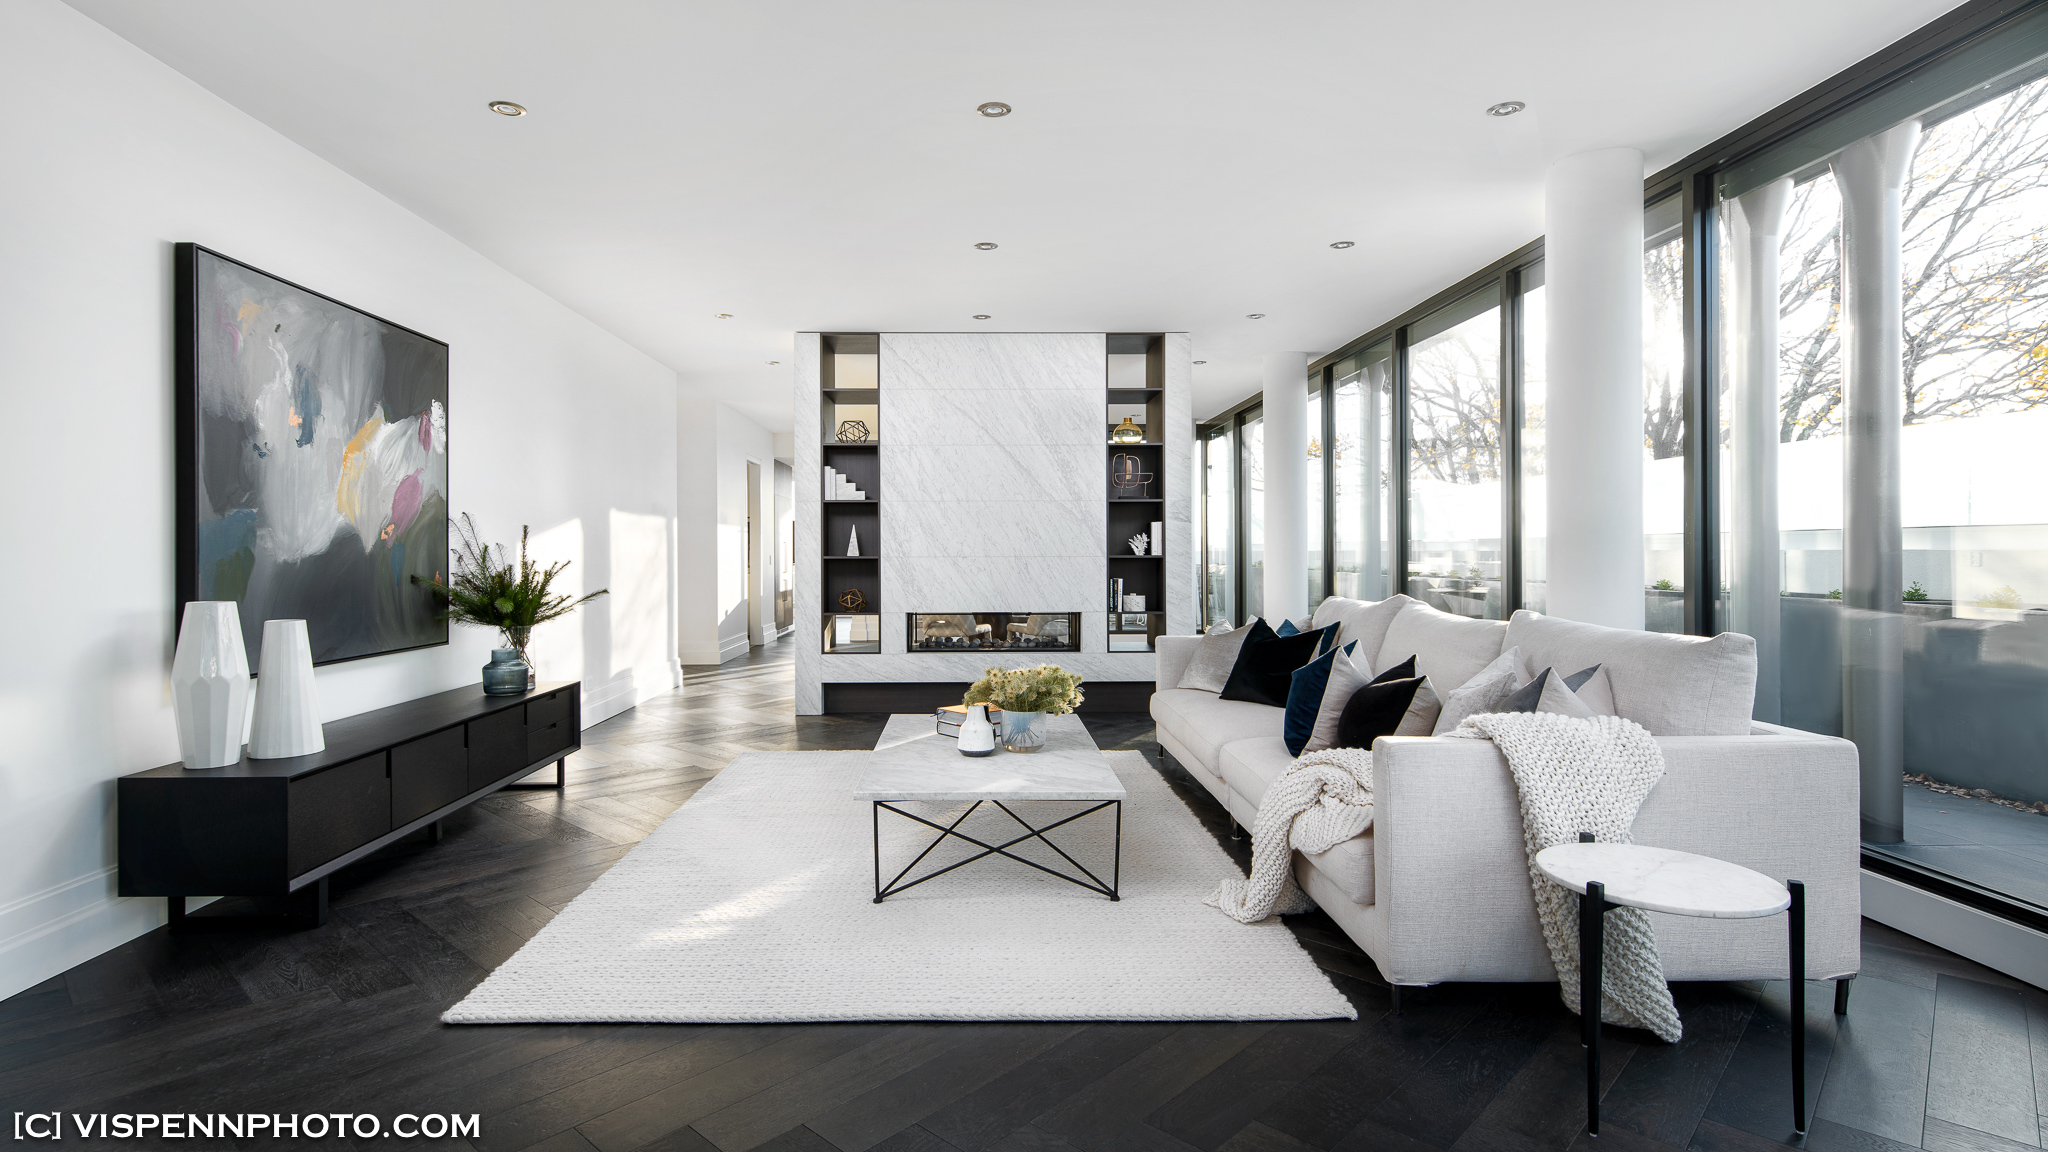 REAL ESTATE INTERIOR Photography Melbourne VISPENN 墨尔本 地产摄影 公寓拍摄 豪宅拍摄 VR远程看房 房产航拍 HAR00025 Edit